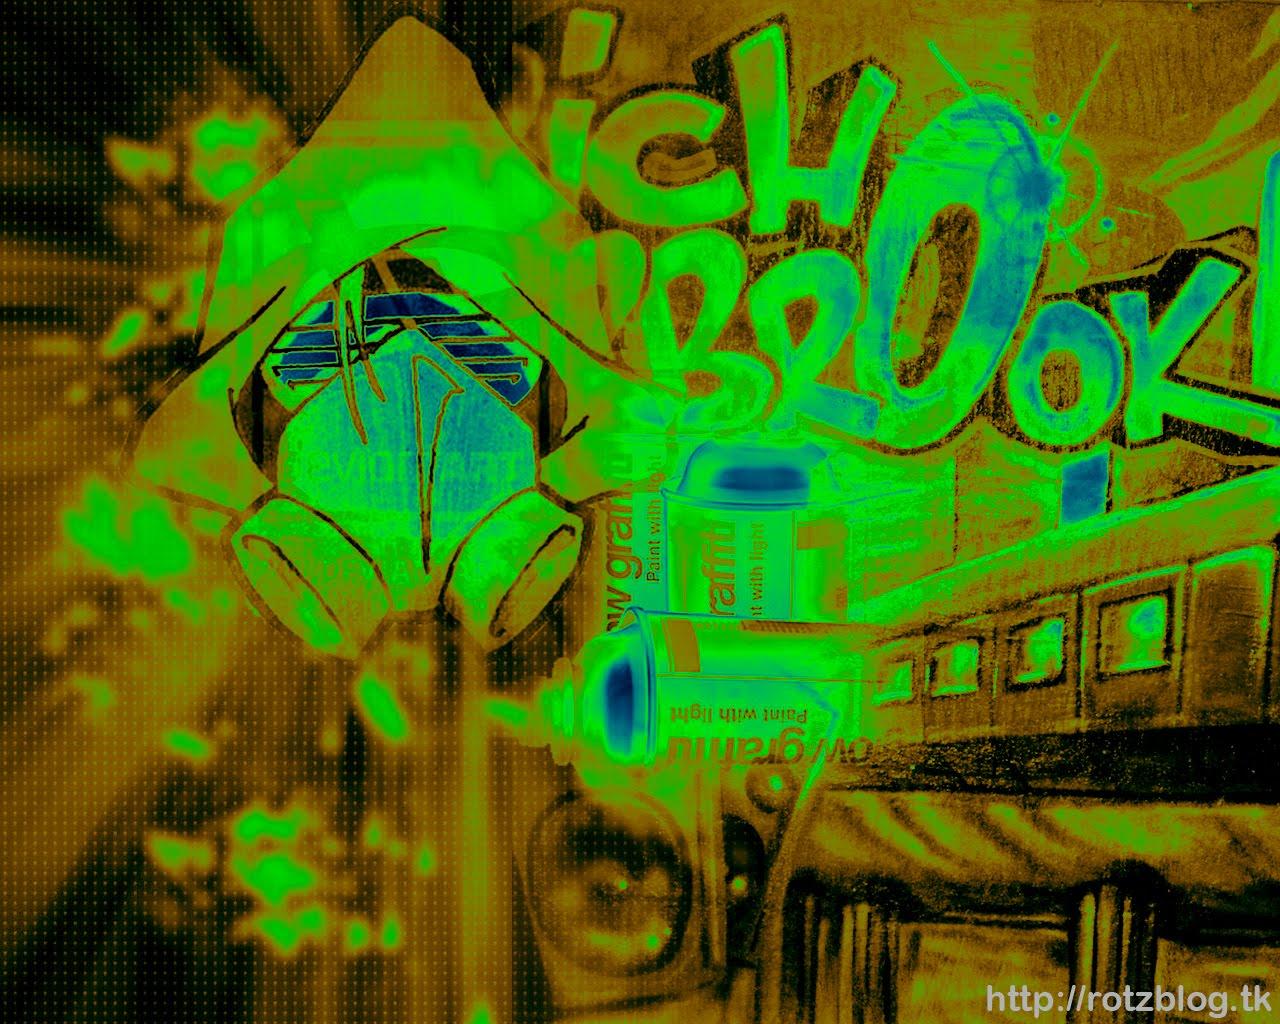 http://2.bp.blogspot.com/_-HEGYYW8vGw/S97FZ5ba_fI/AAAAAAAAAGE/UfXqVZCEYBg/s1600/Sprayer.jpg